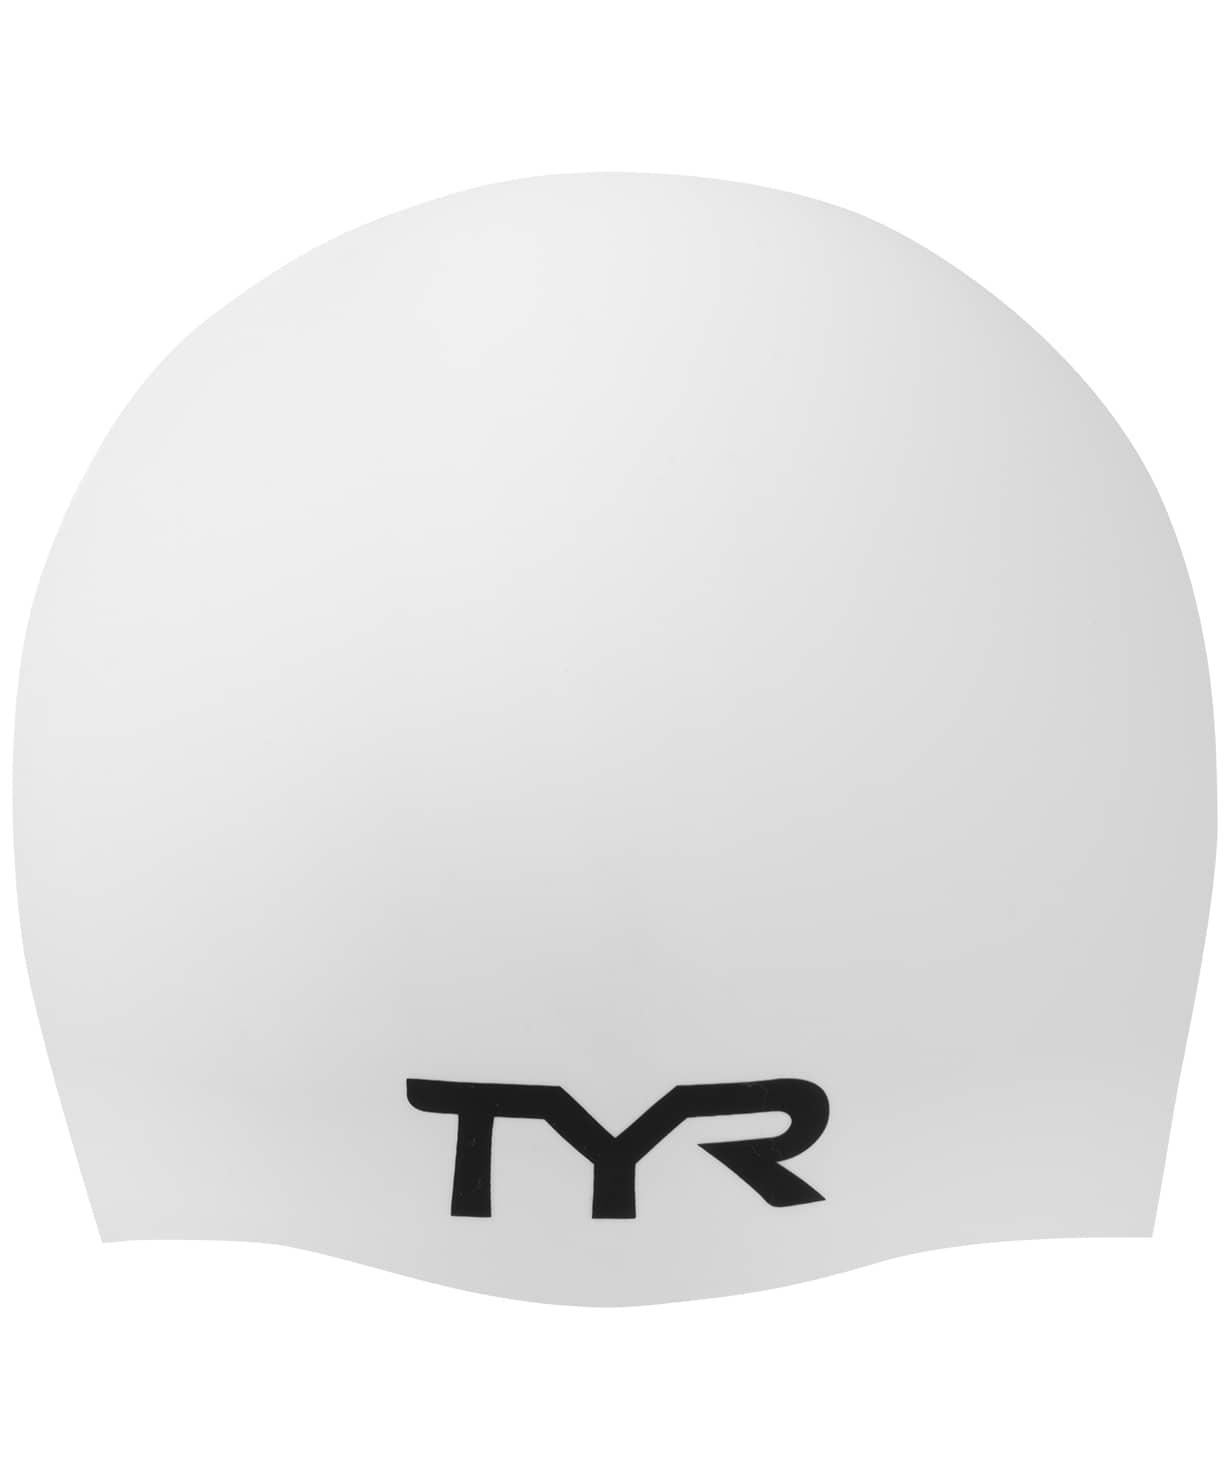 Шапочка для плавания Wrinkle Free Silicone Cap, силикон, LCS/100, белый